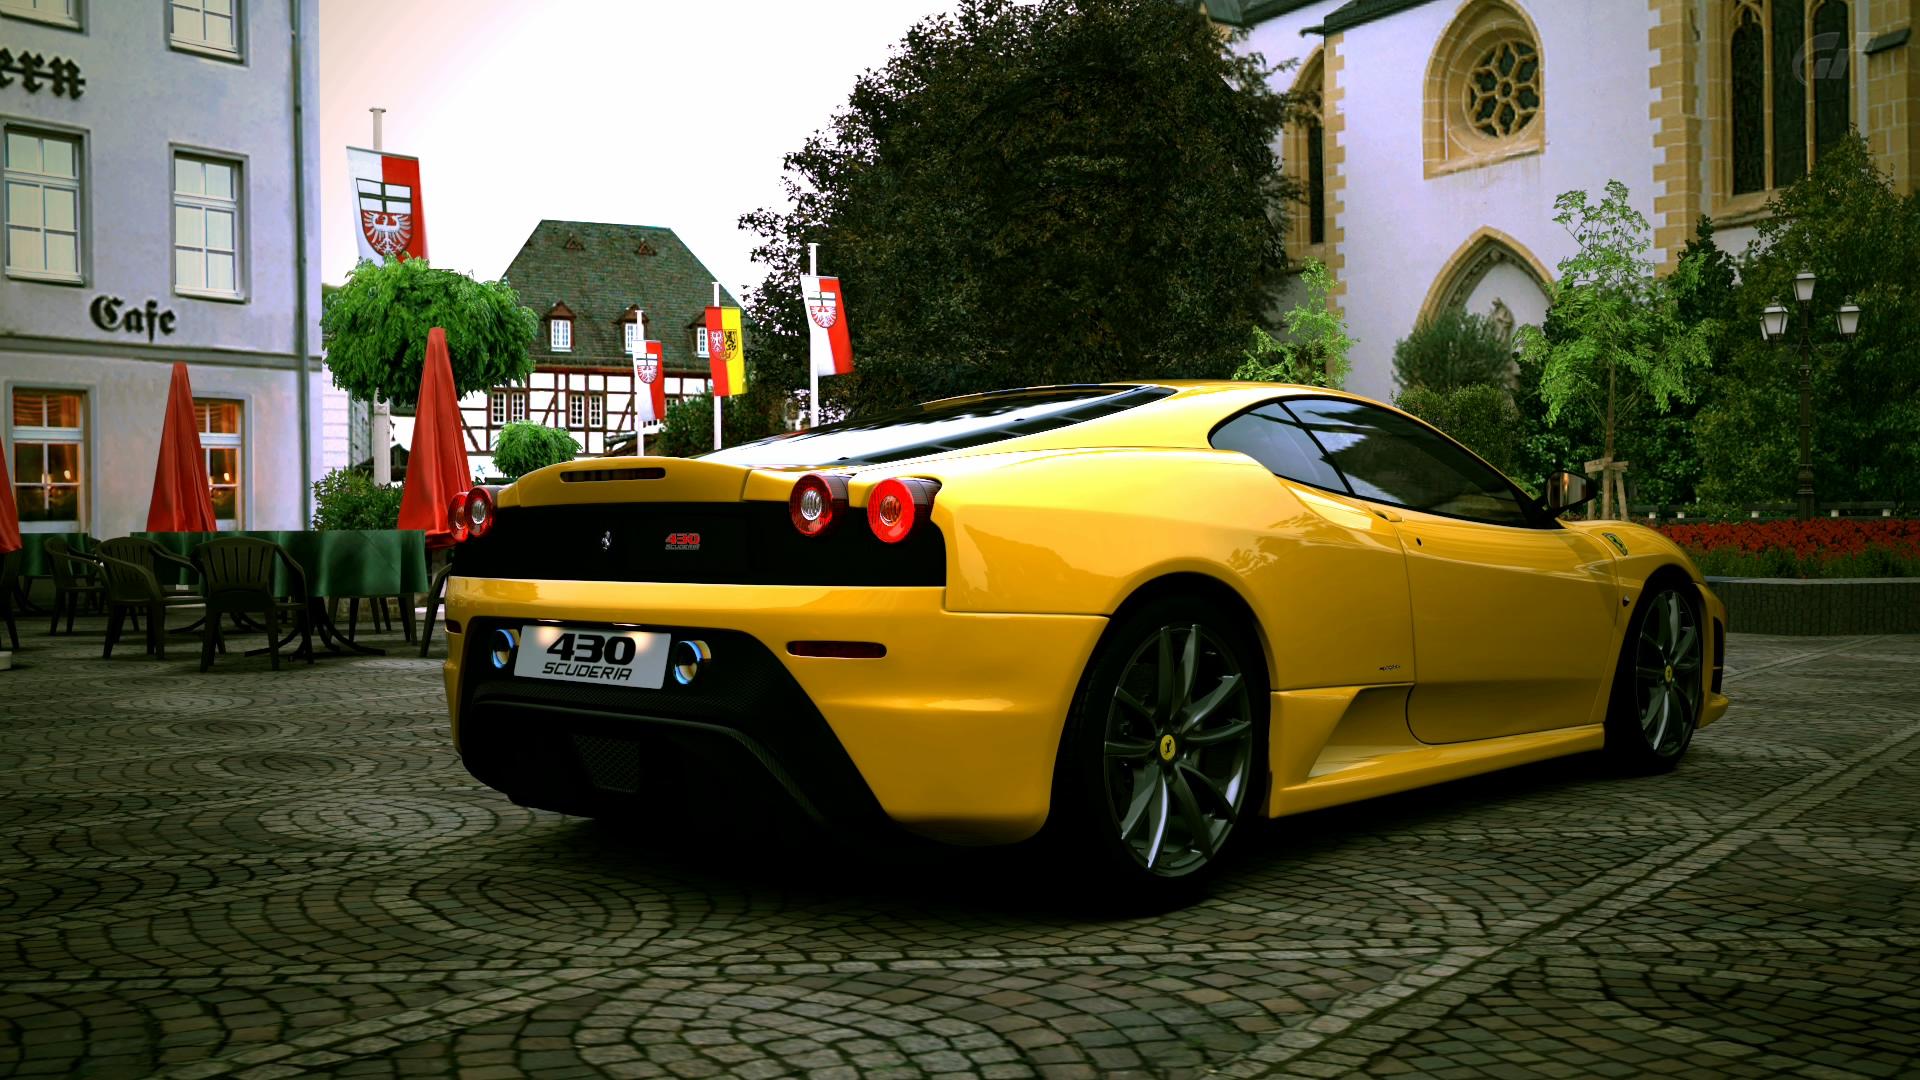 Ferrari 430 Scuderia by DjCaDiR